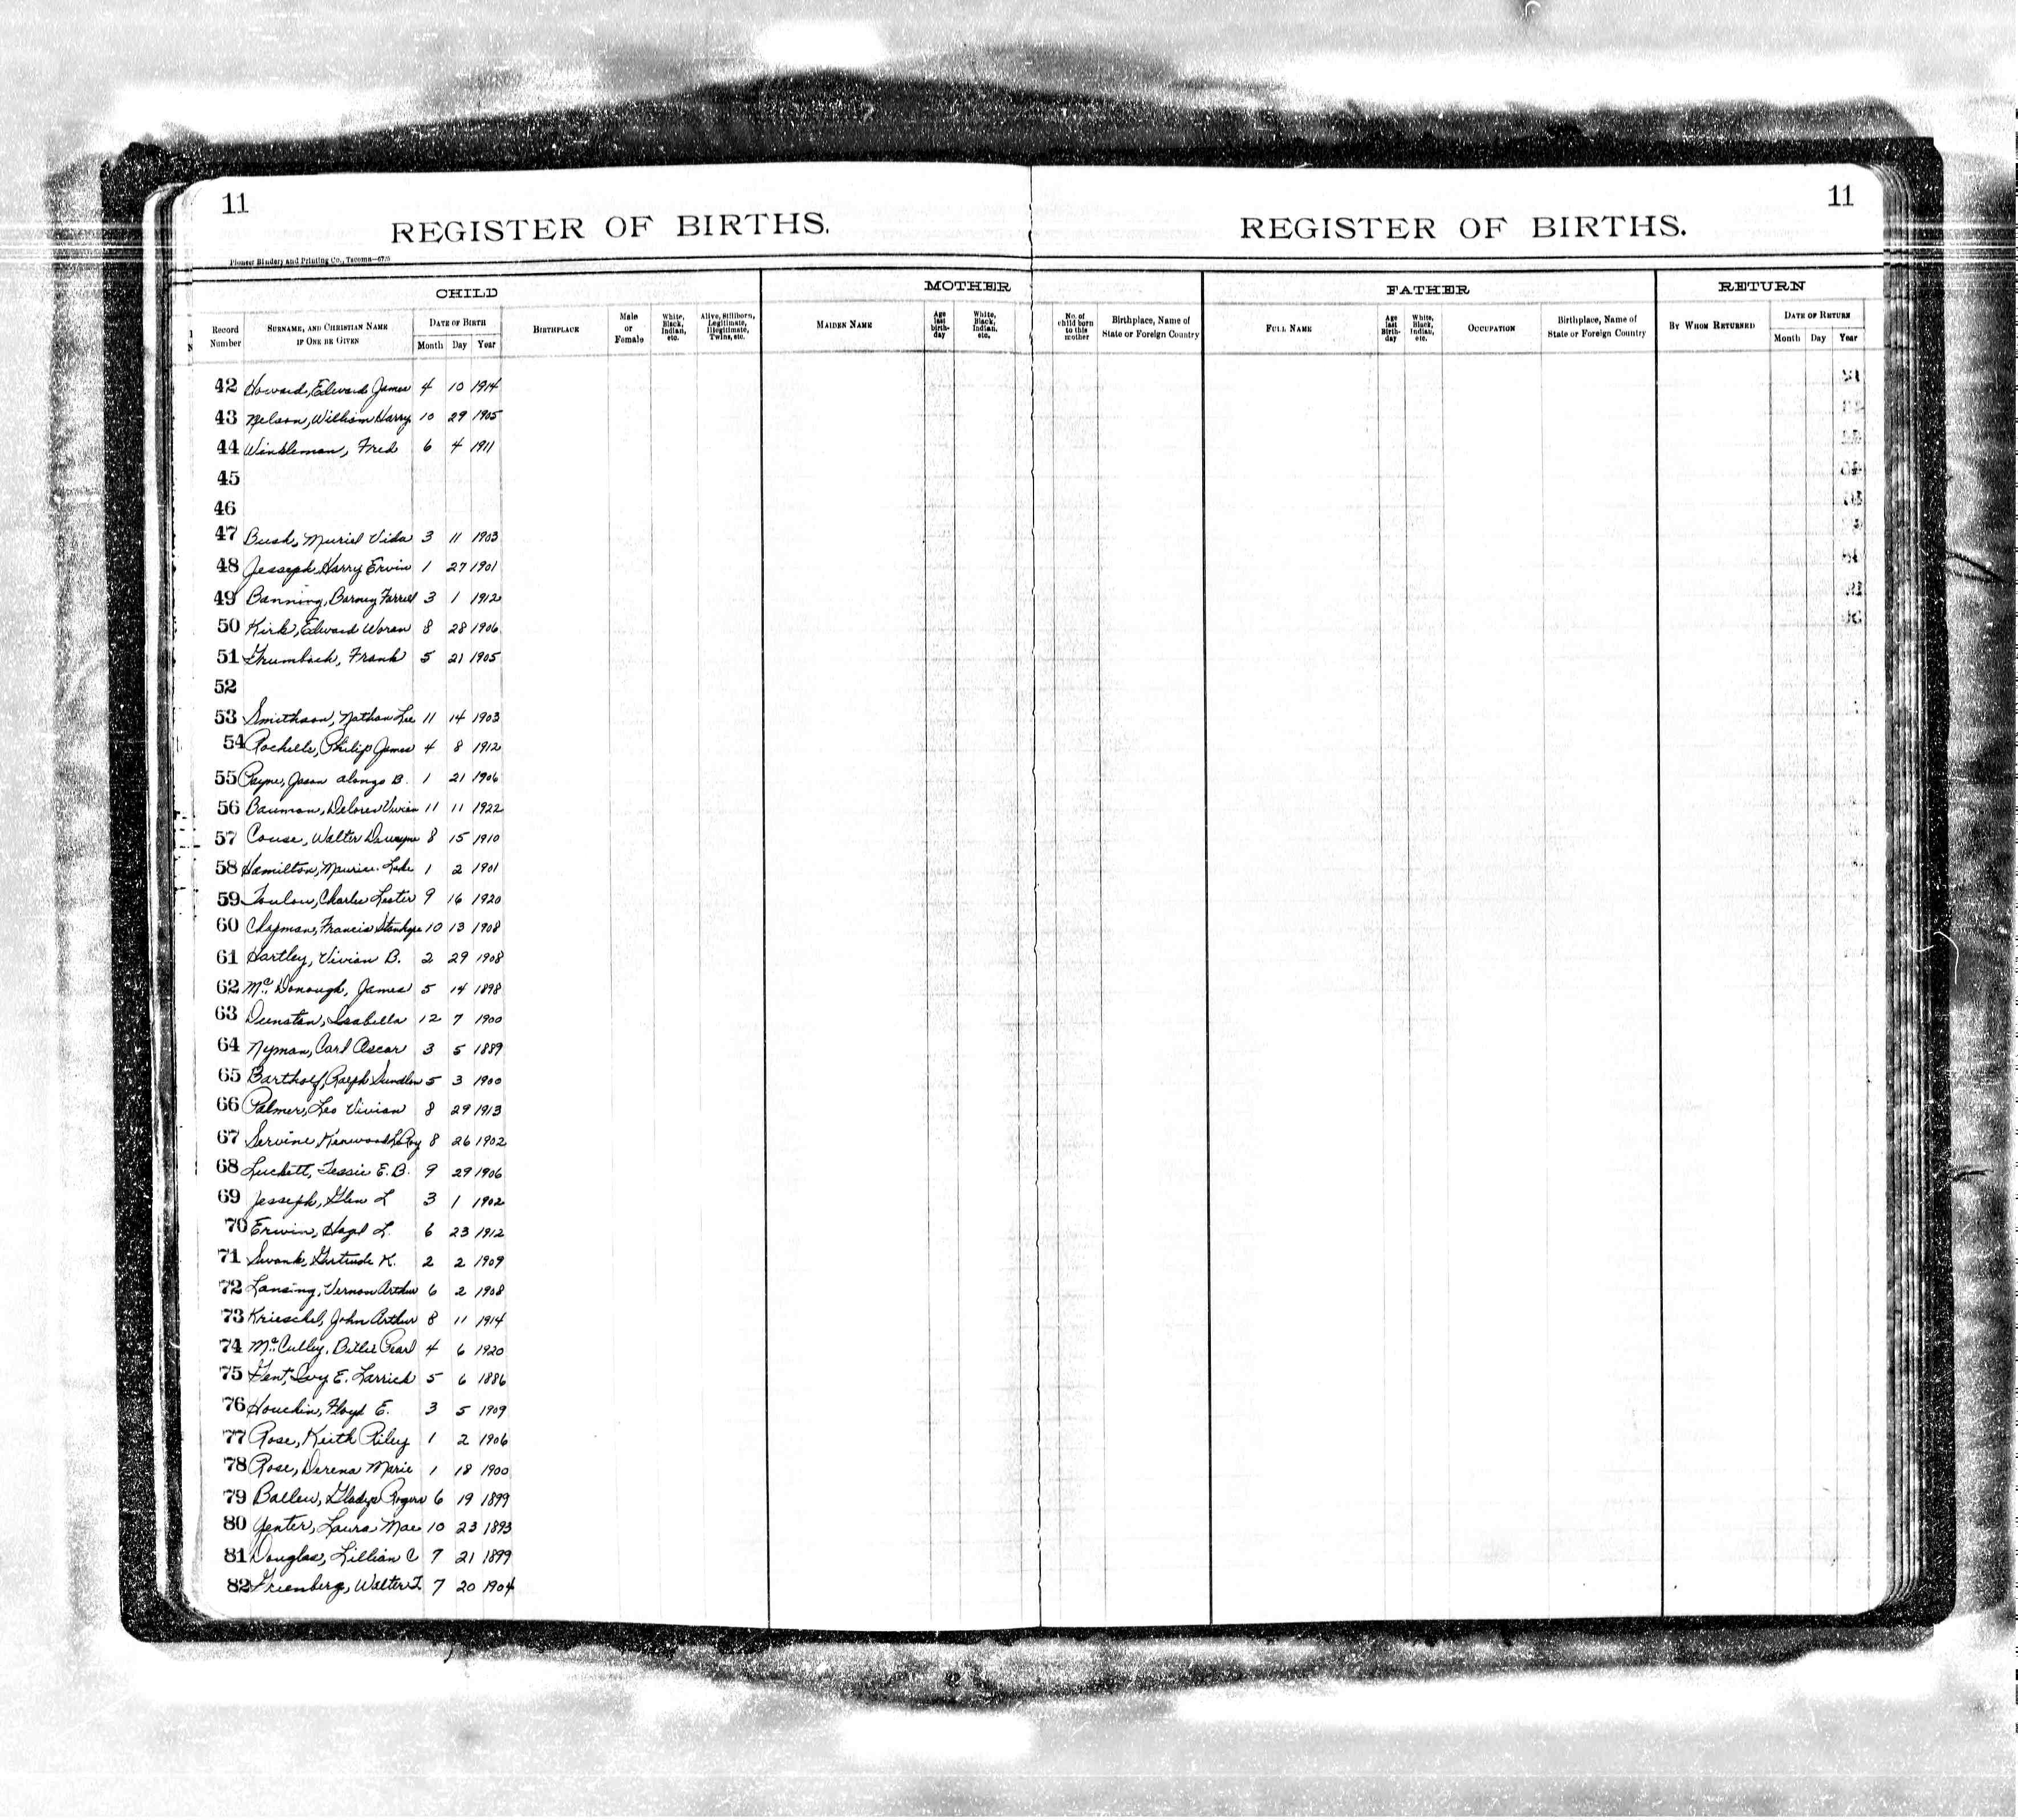 Myhamiltonfamily selected hamilton family documents page 8 maurice lake hamilton birth record washington state jan 2 1901 xflitez Choice Image